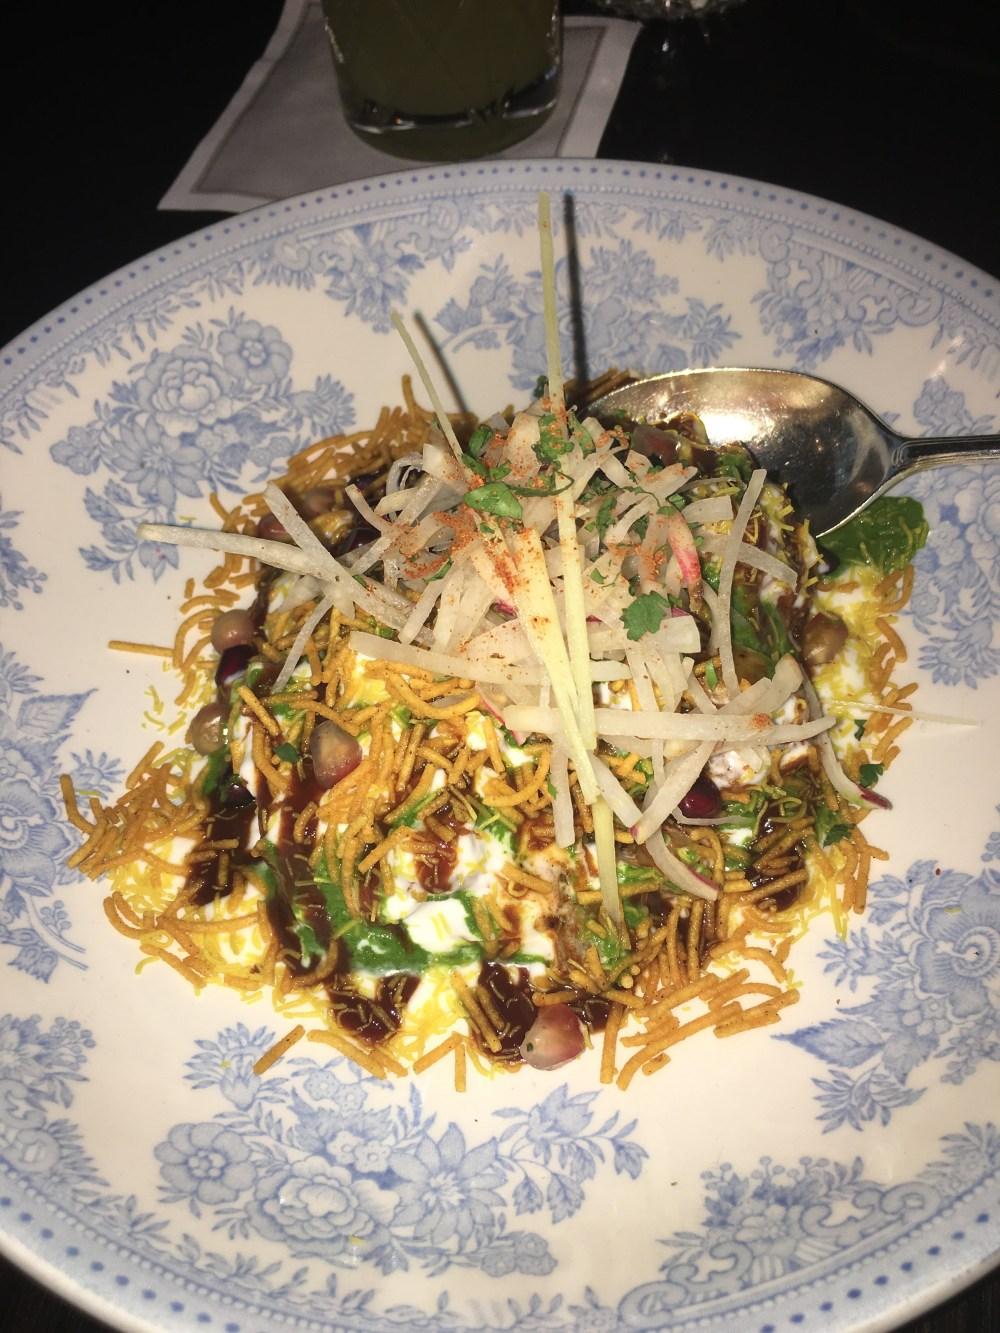 LondonsDiningCouple Gymkhana Restaurant Review | Top 10 Dishes in London | Top 10 Restaurants in London 2017